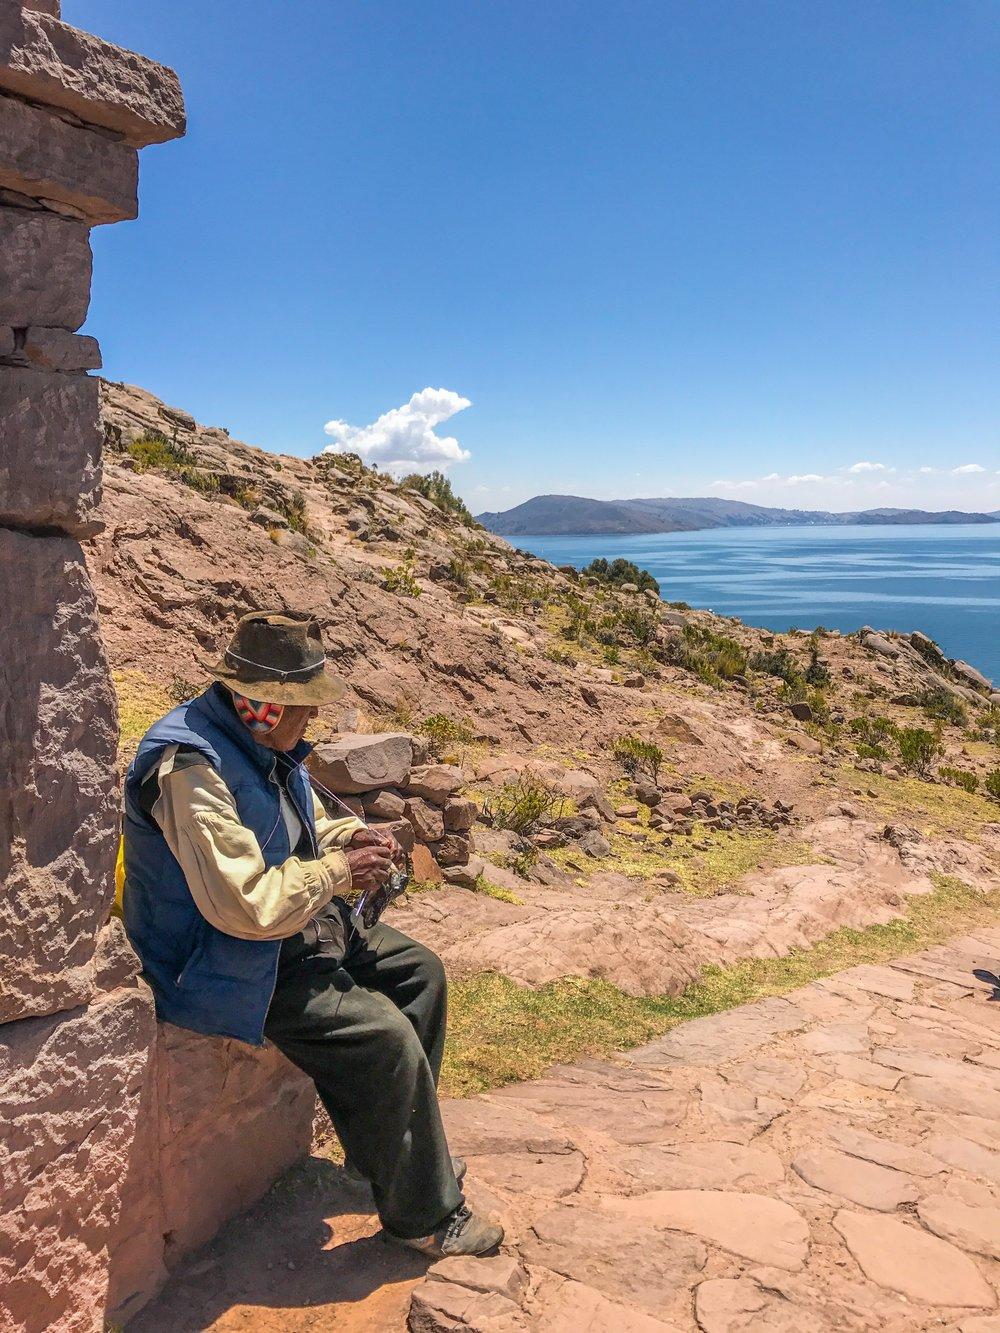 An elder Taquile man knitting